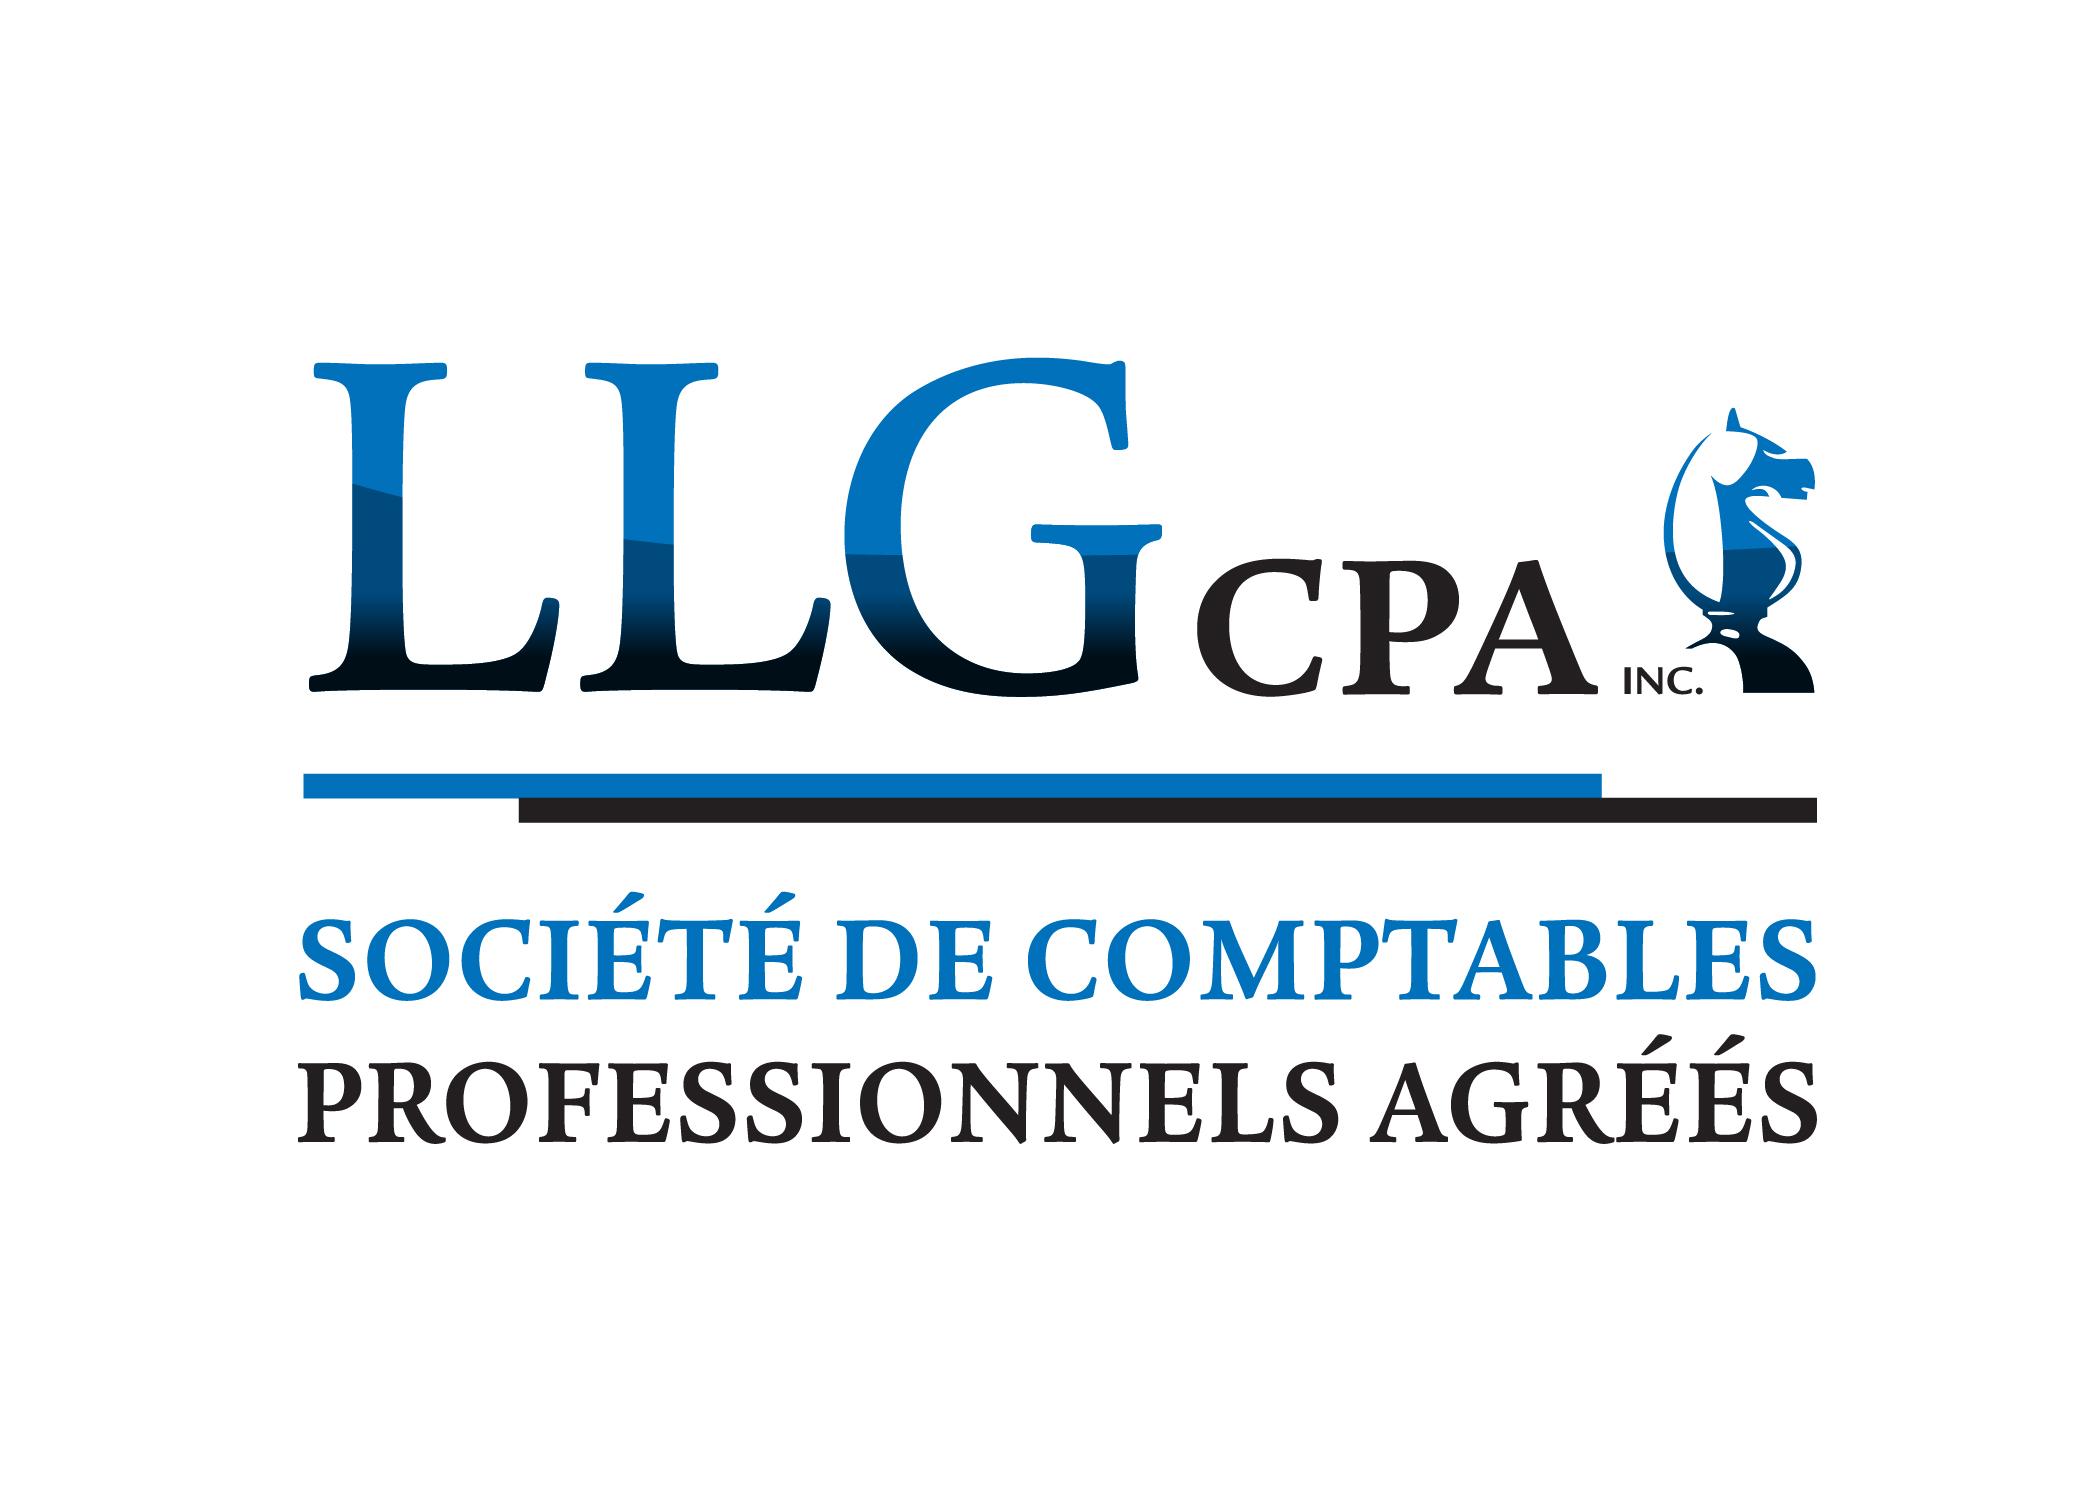 LLG CPA-logo